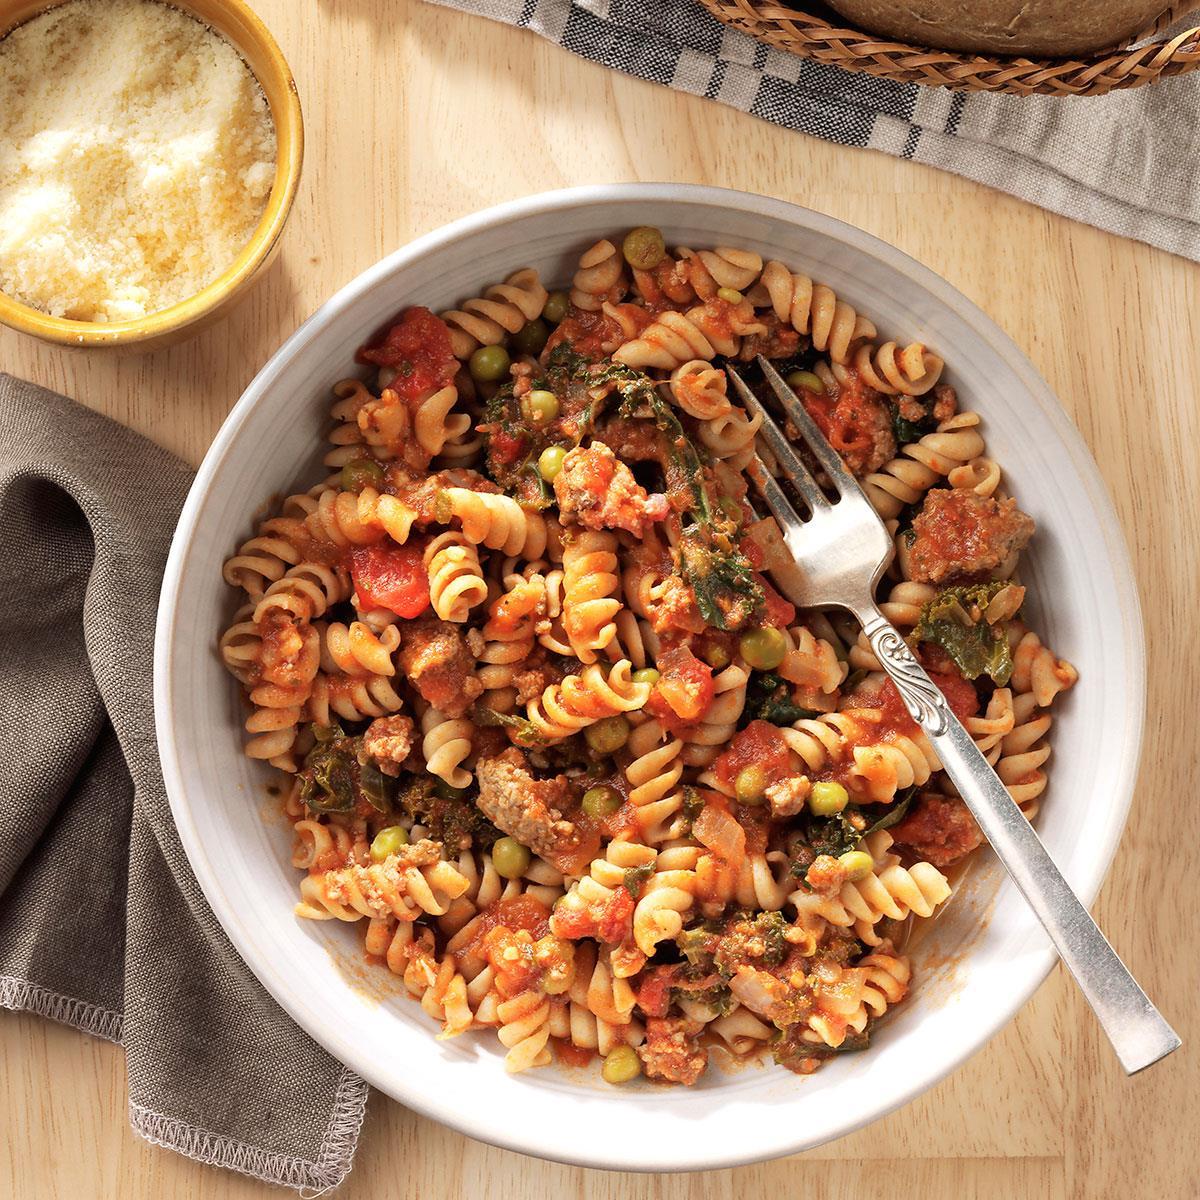 Fullsize Of Hearty Vegetarian Meals